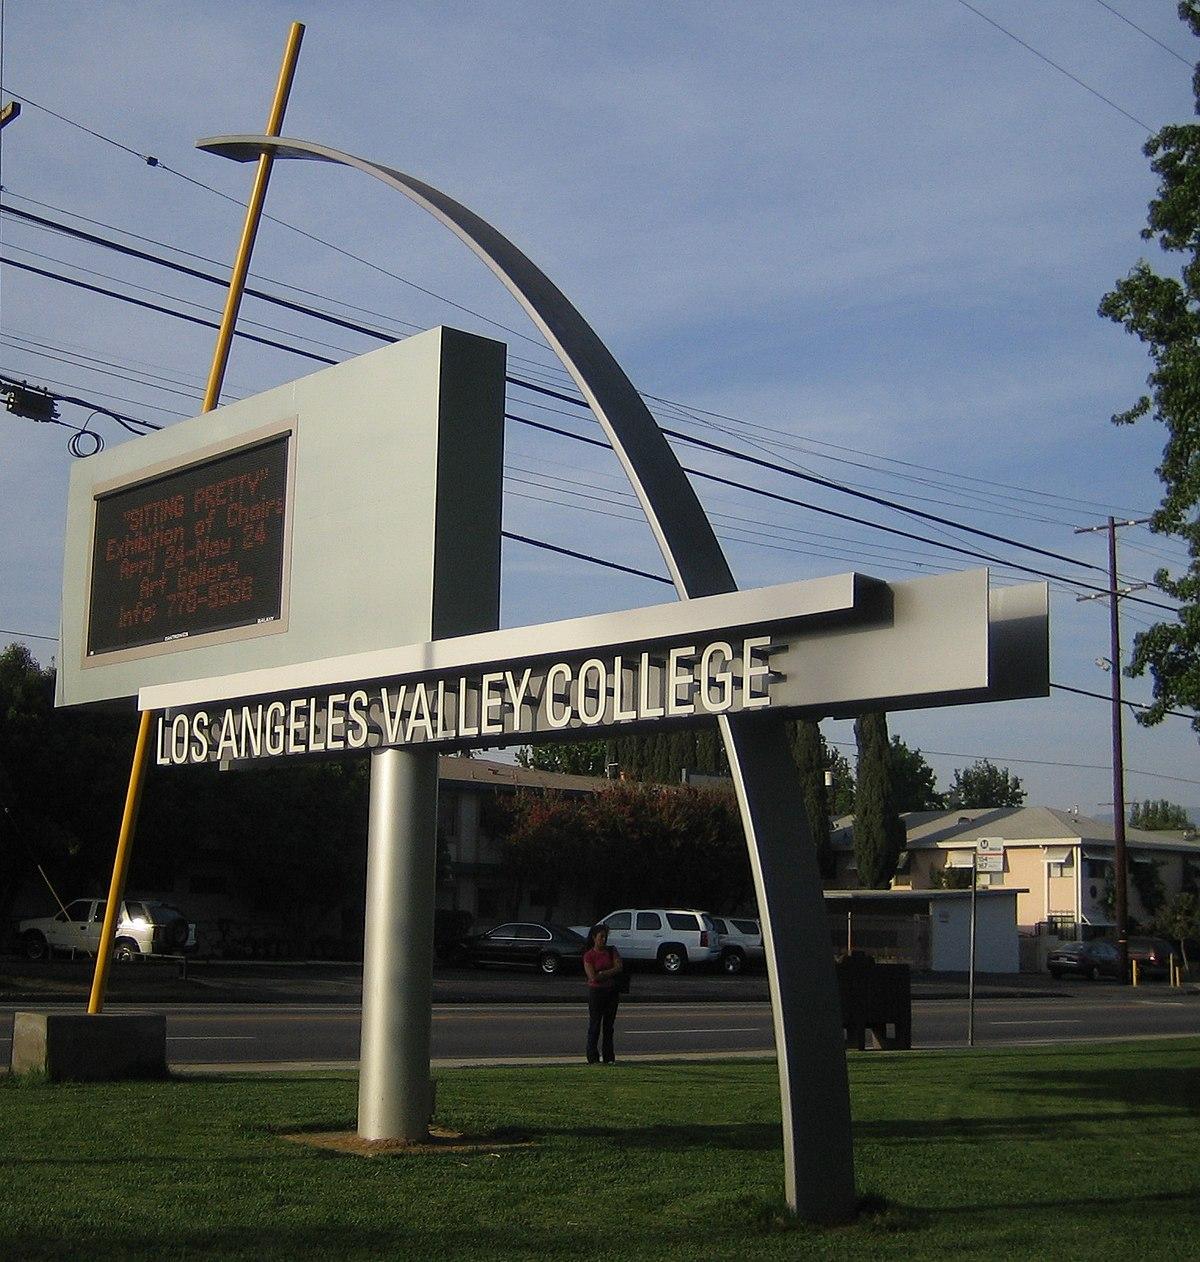 Los Angeles Valley College 57